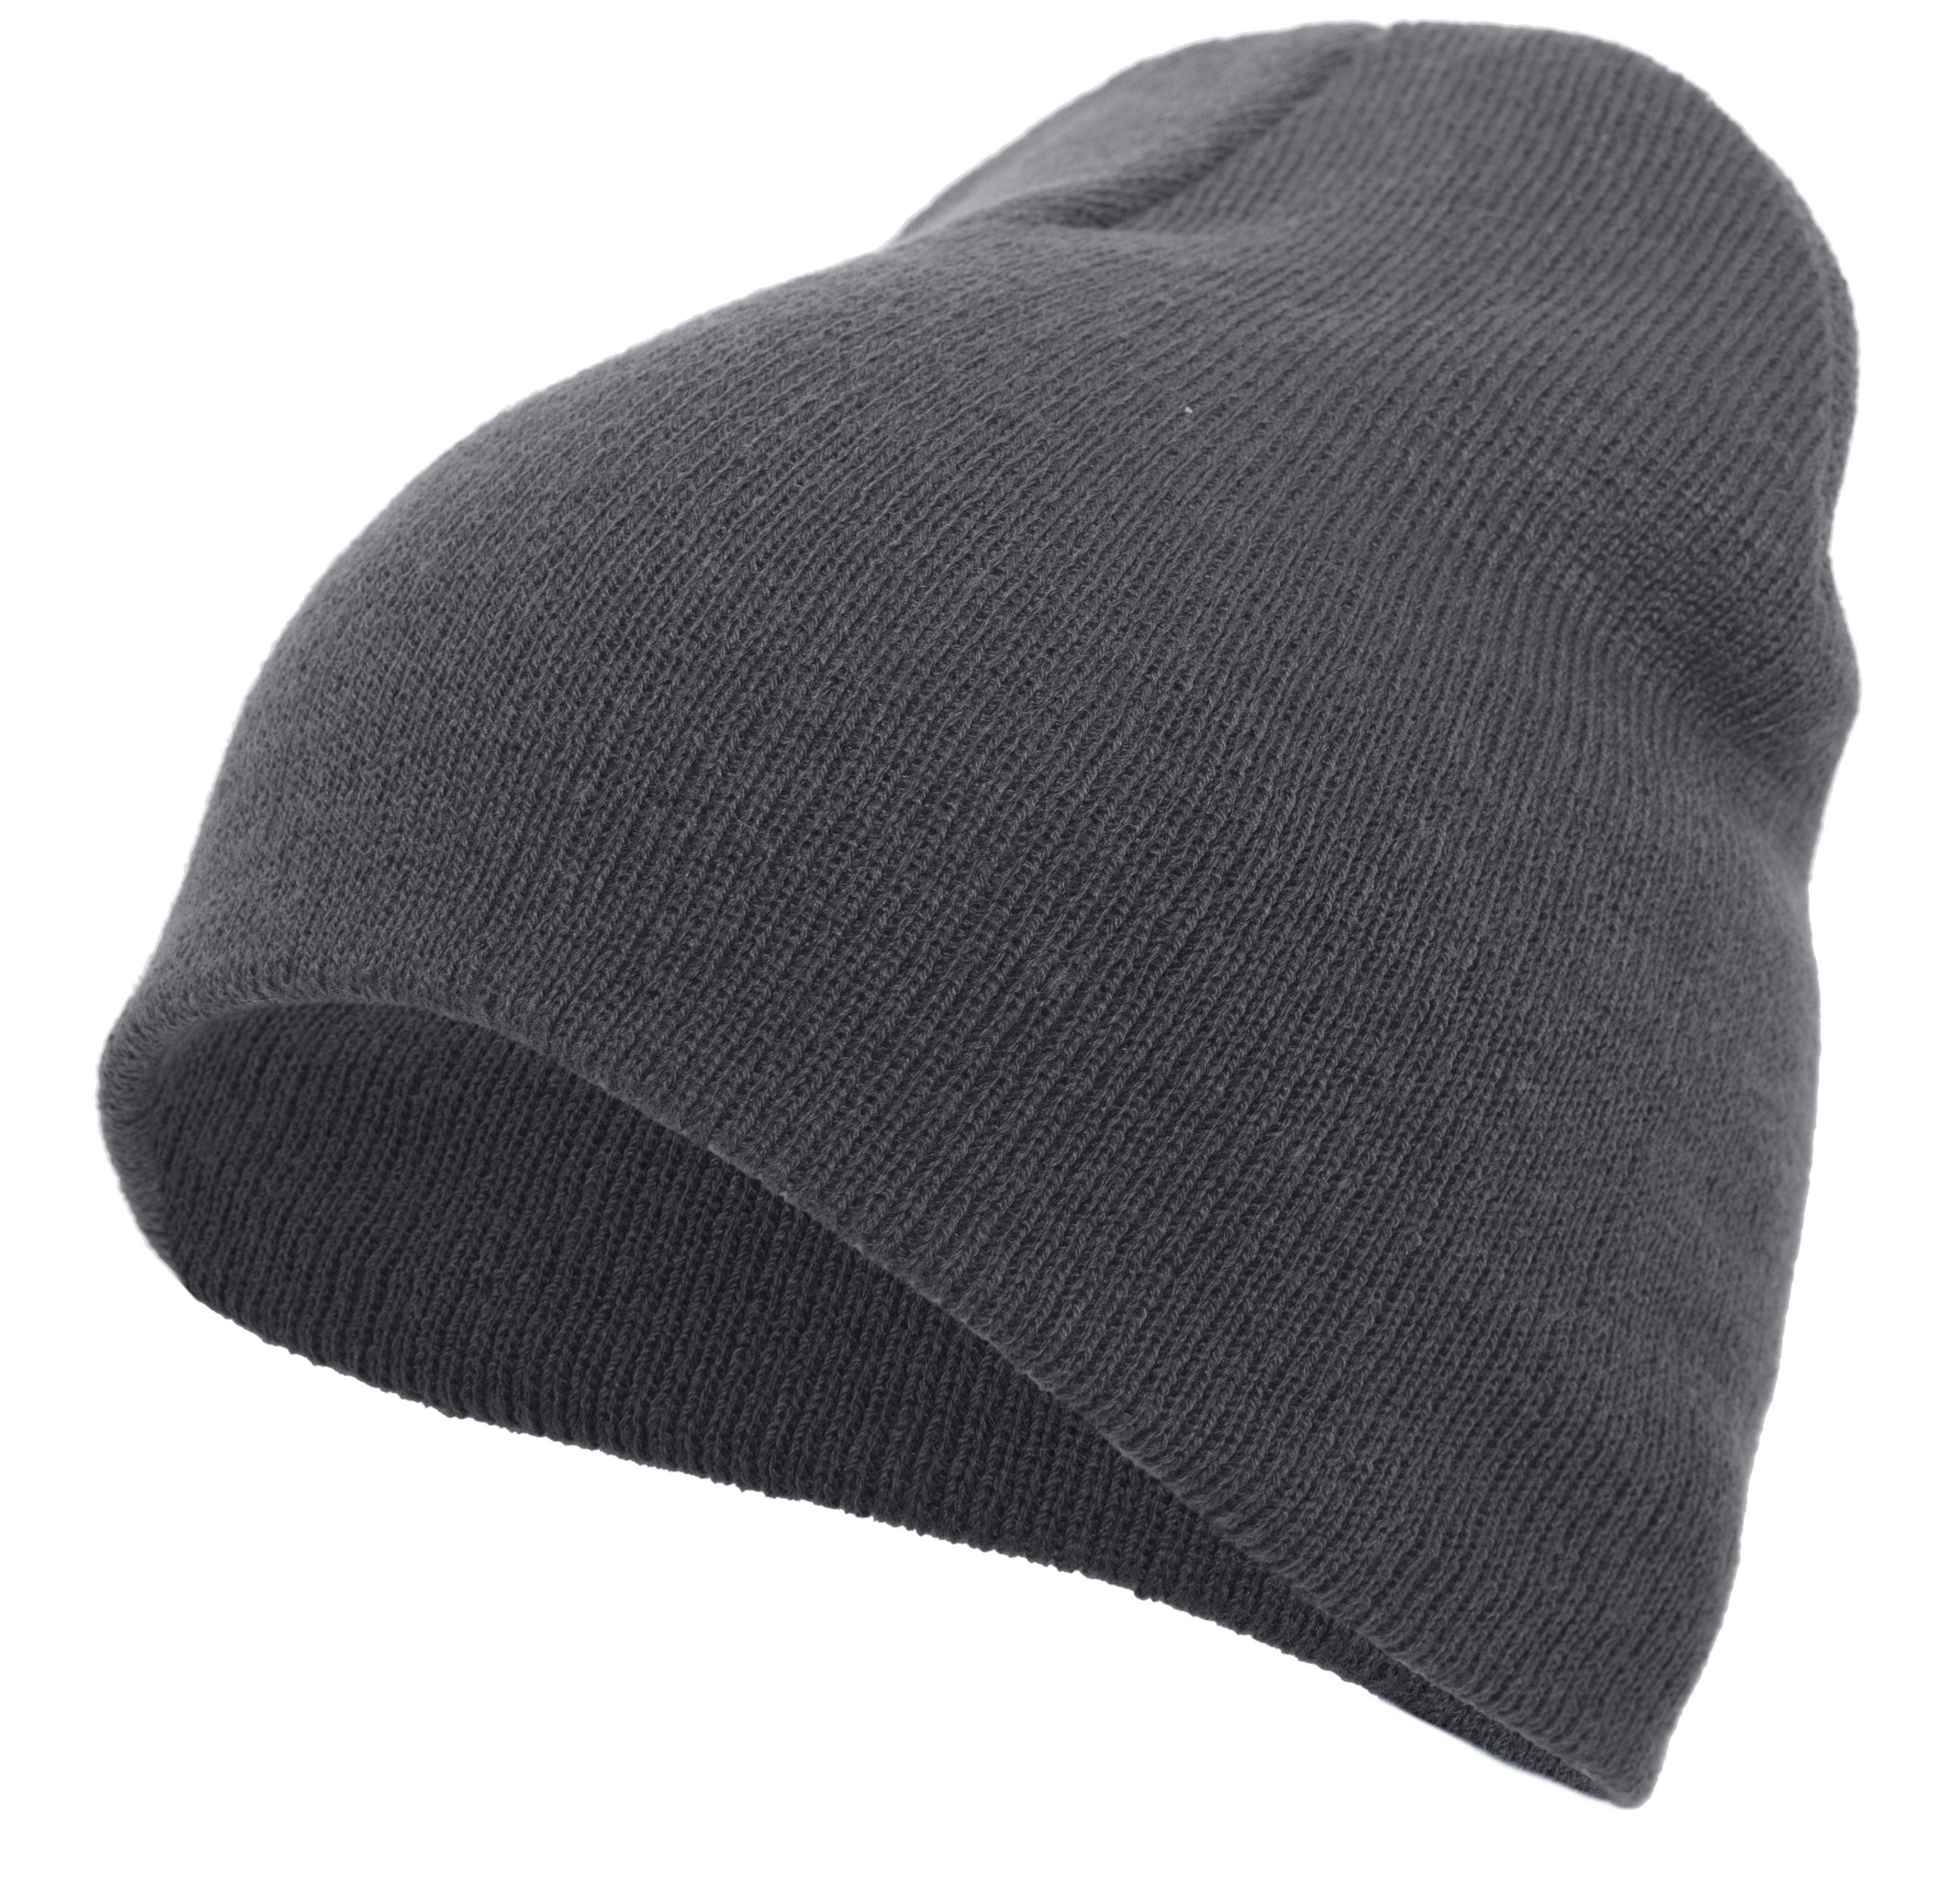 Basic Knit Beanie - GRAPHITE